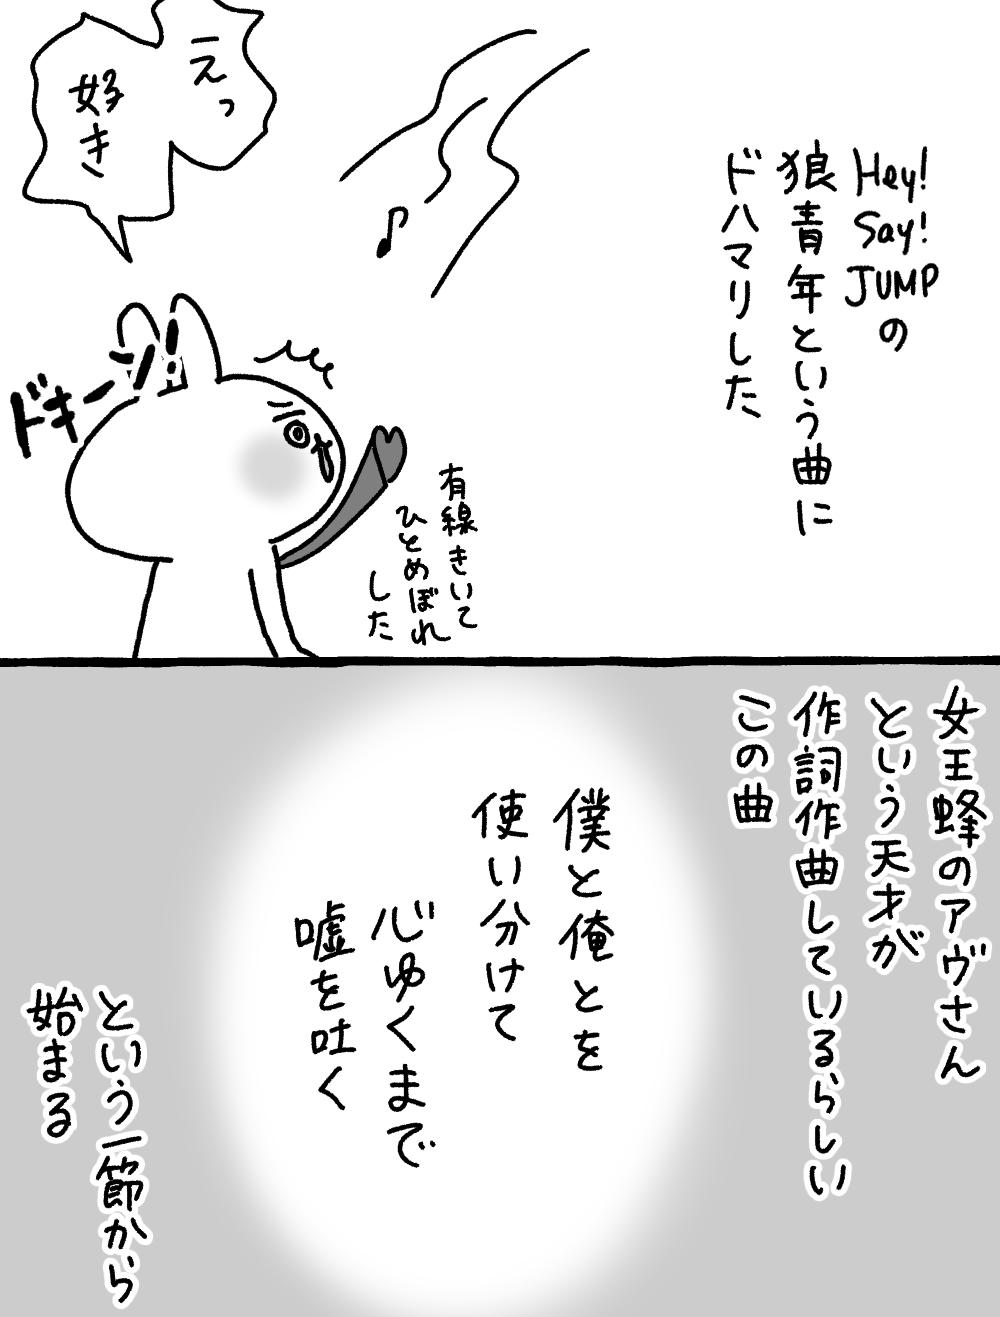 Hey!Say!JUMPの「狼青年」にドハマりしたので日本語の一人称の面白さを語りたい